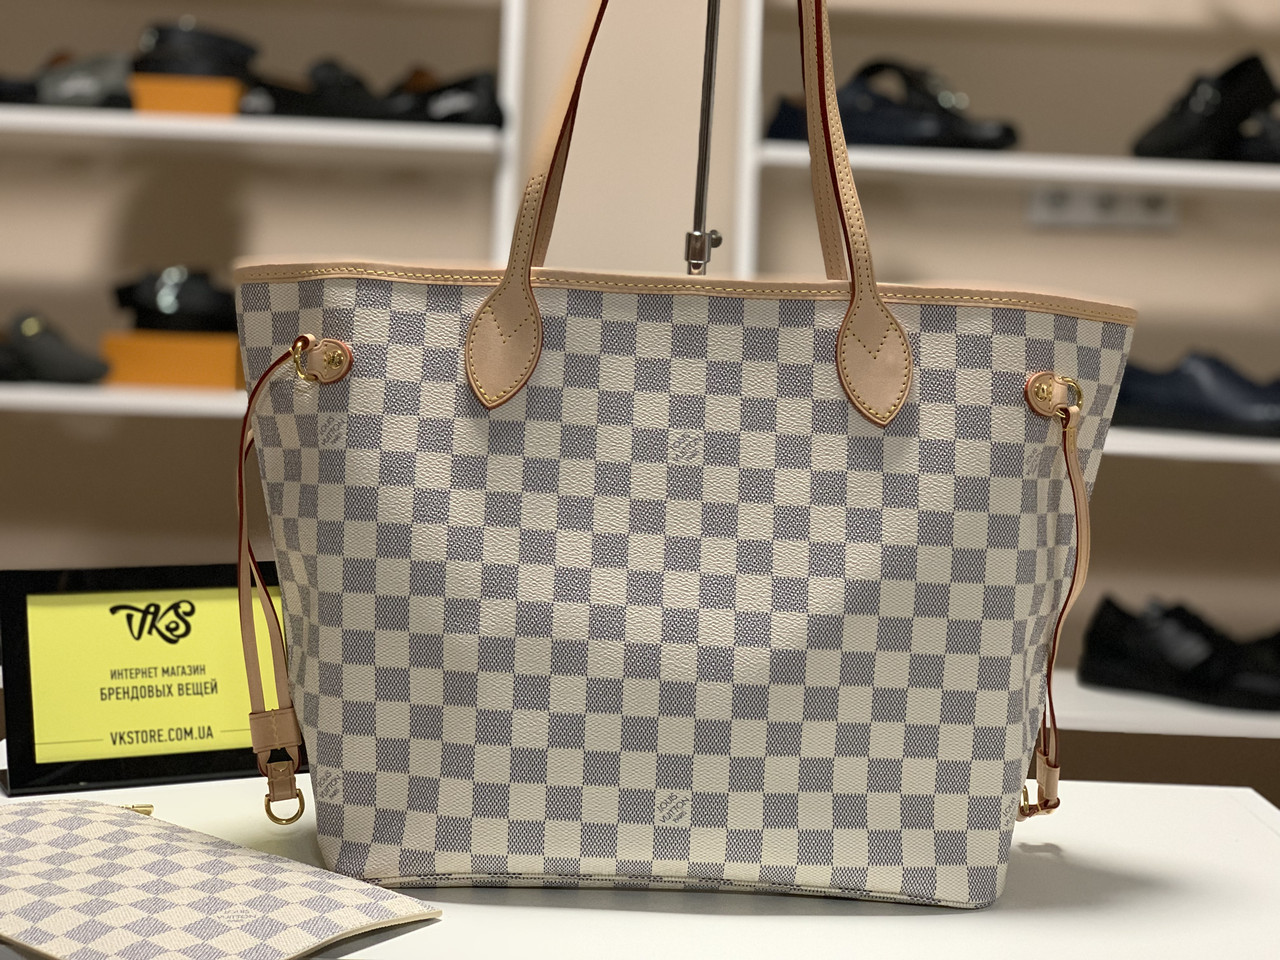 b589c0215d77 Сумки Луи Виттон - Louis Vuitton сумка Neverfull | vkstore.com.ua